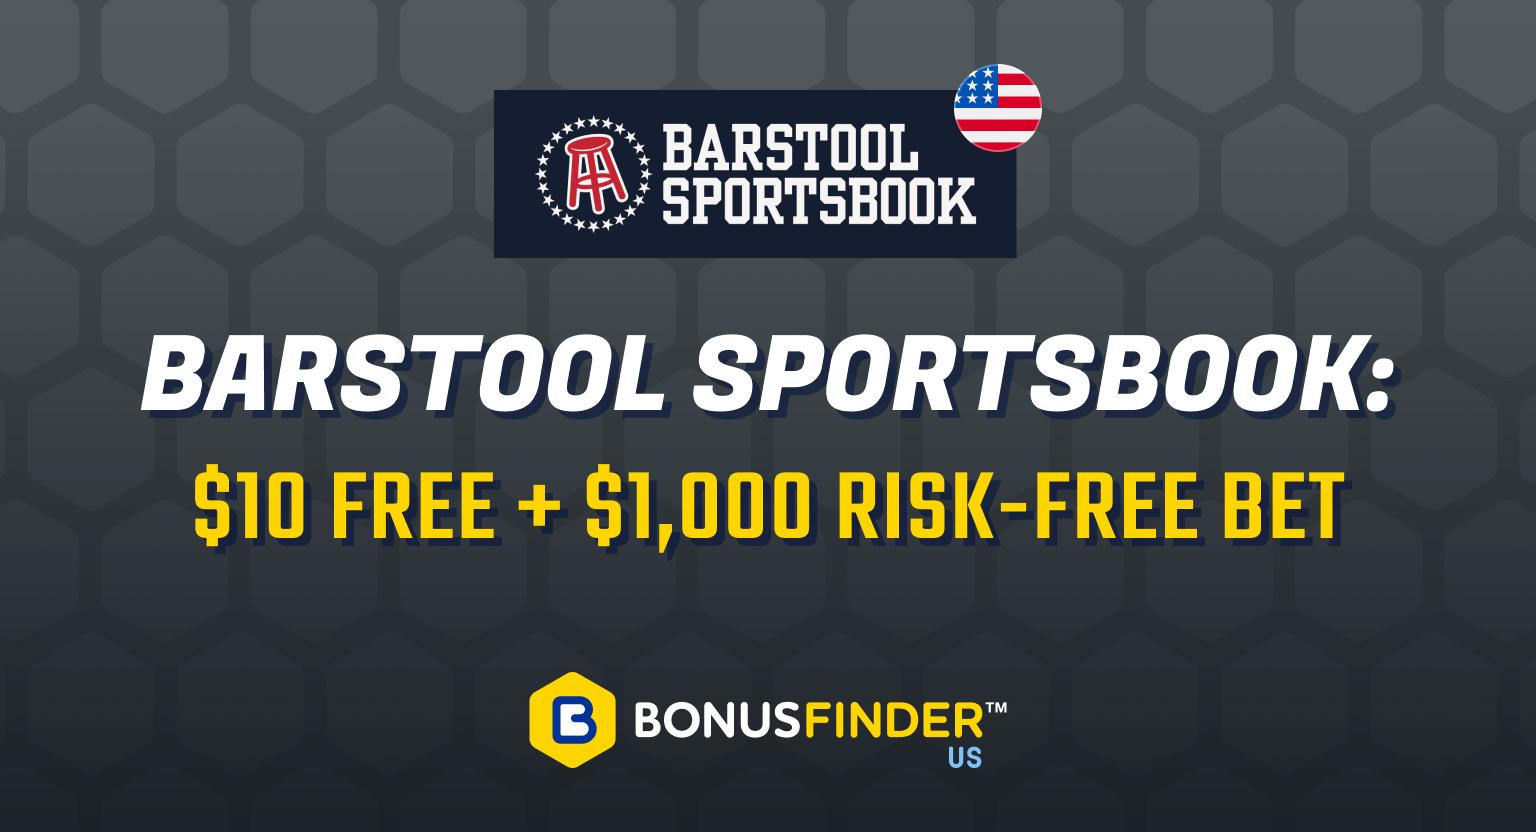 Barstool Sportsbook promo code